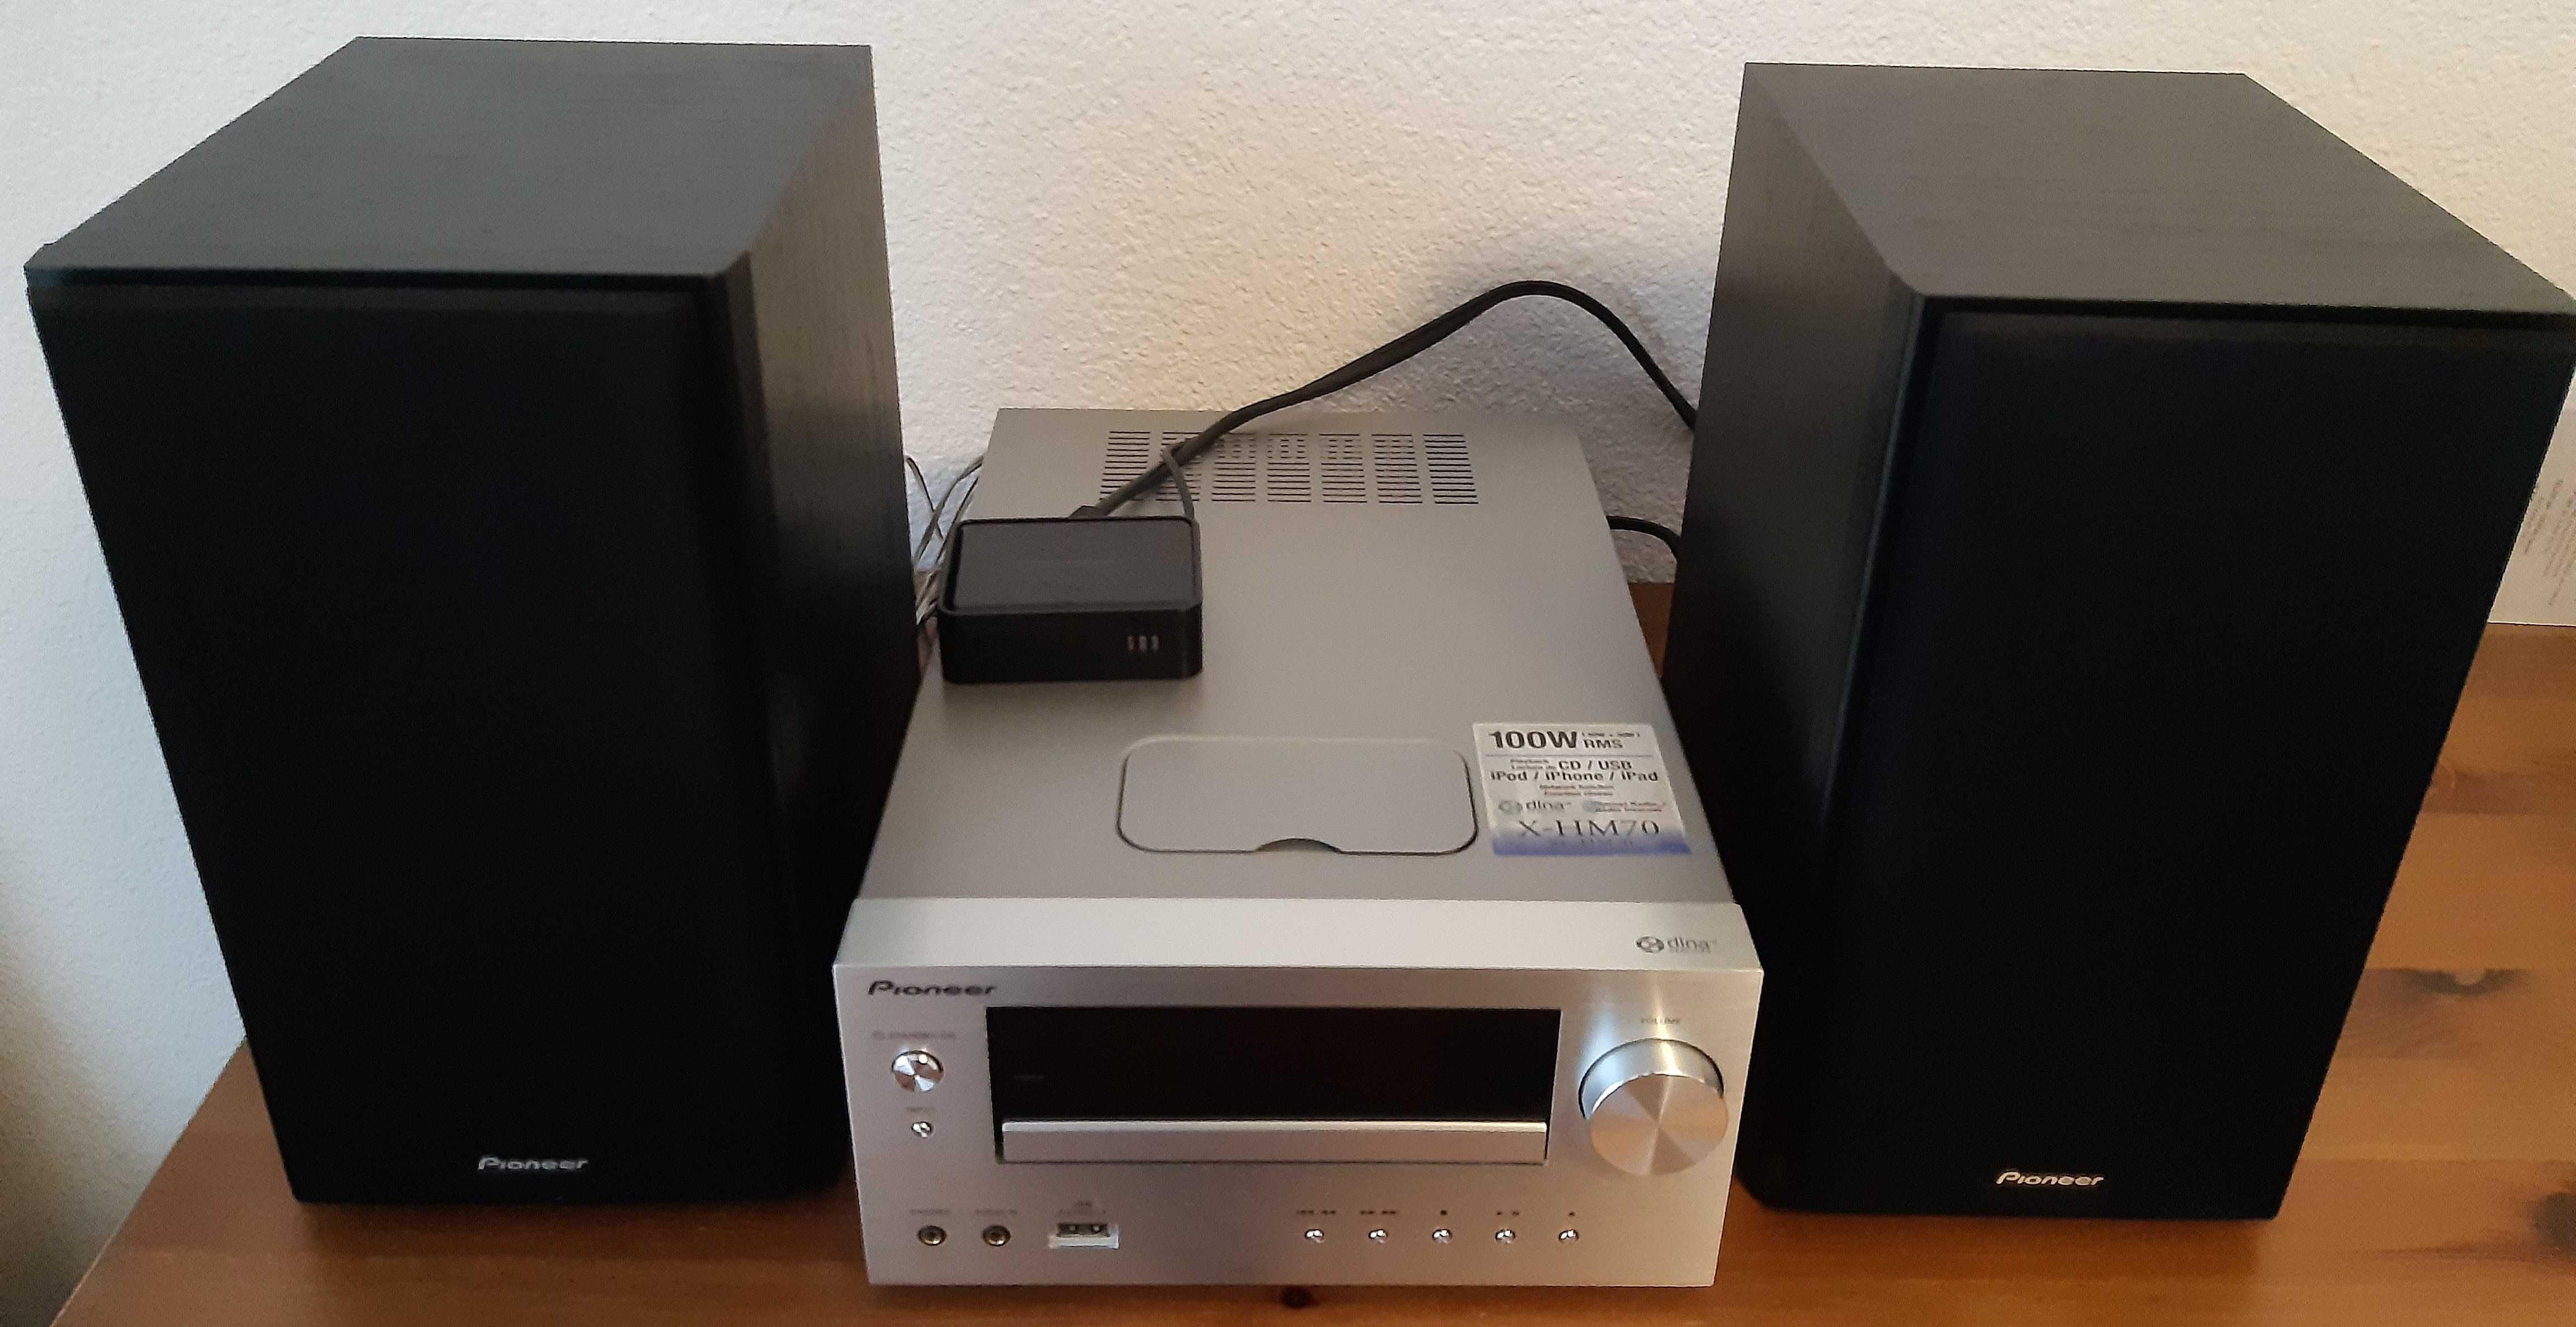 Pioneer XC-HM70 100W CD, DLNA, Radio Internetowe + Iphone 4S.